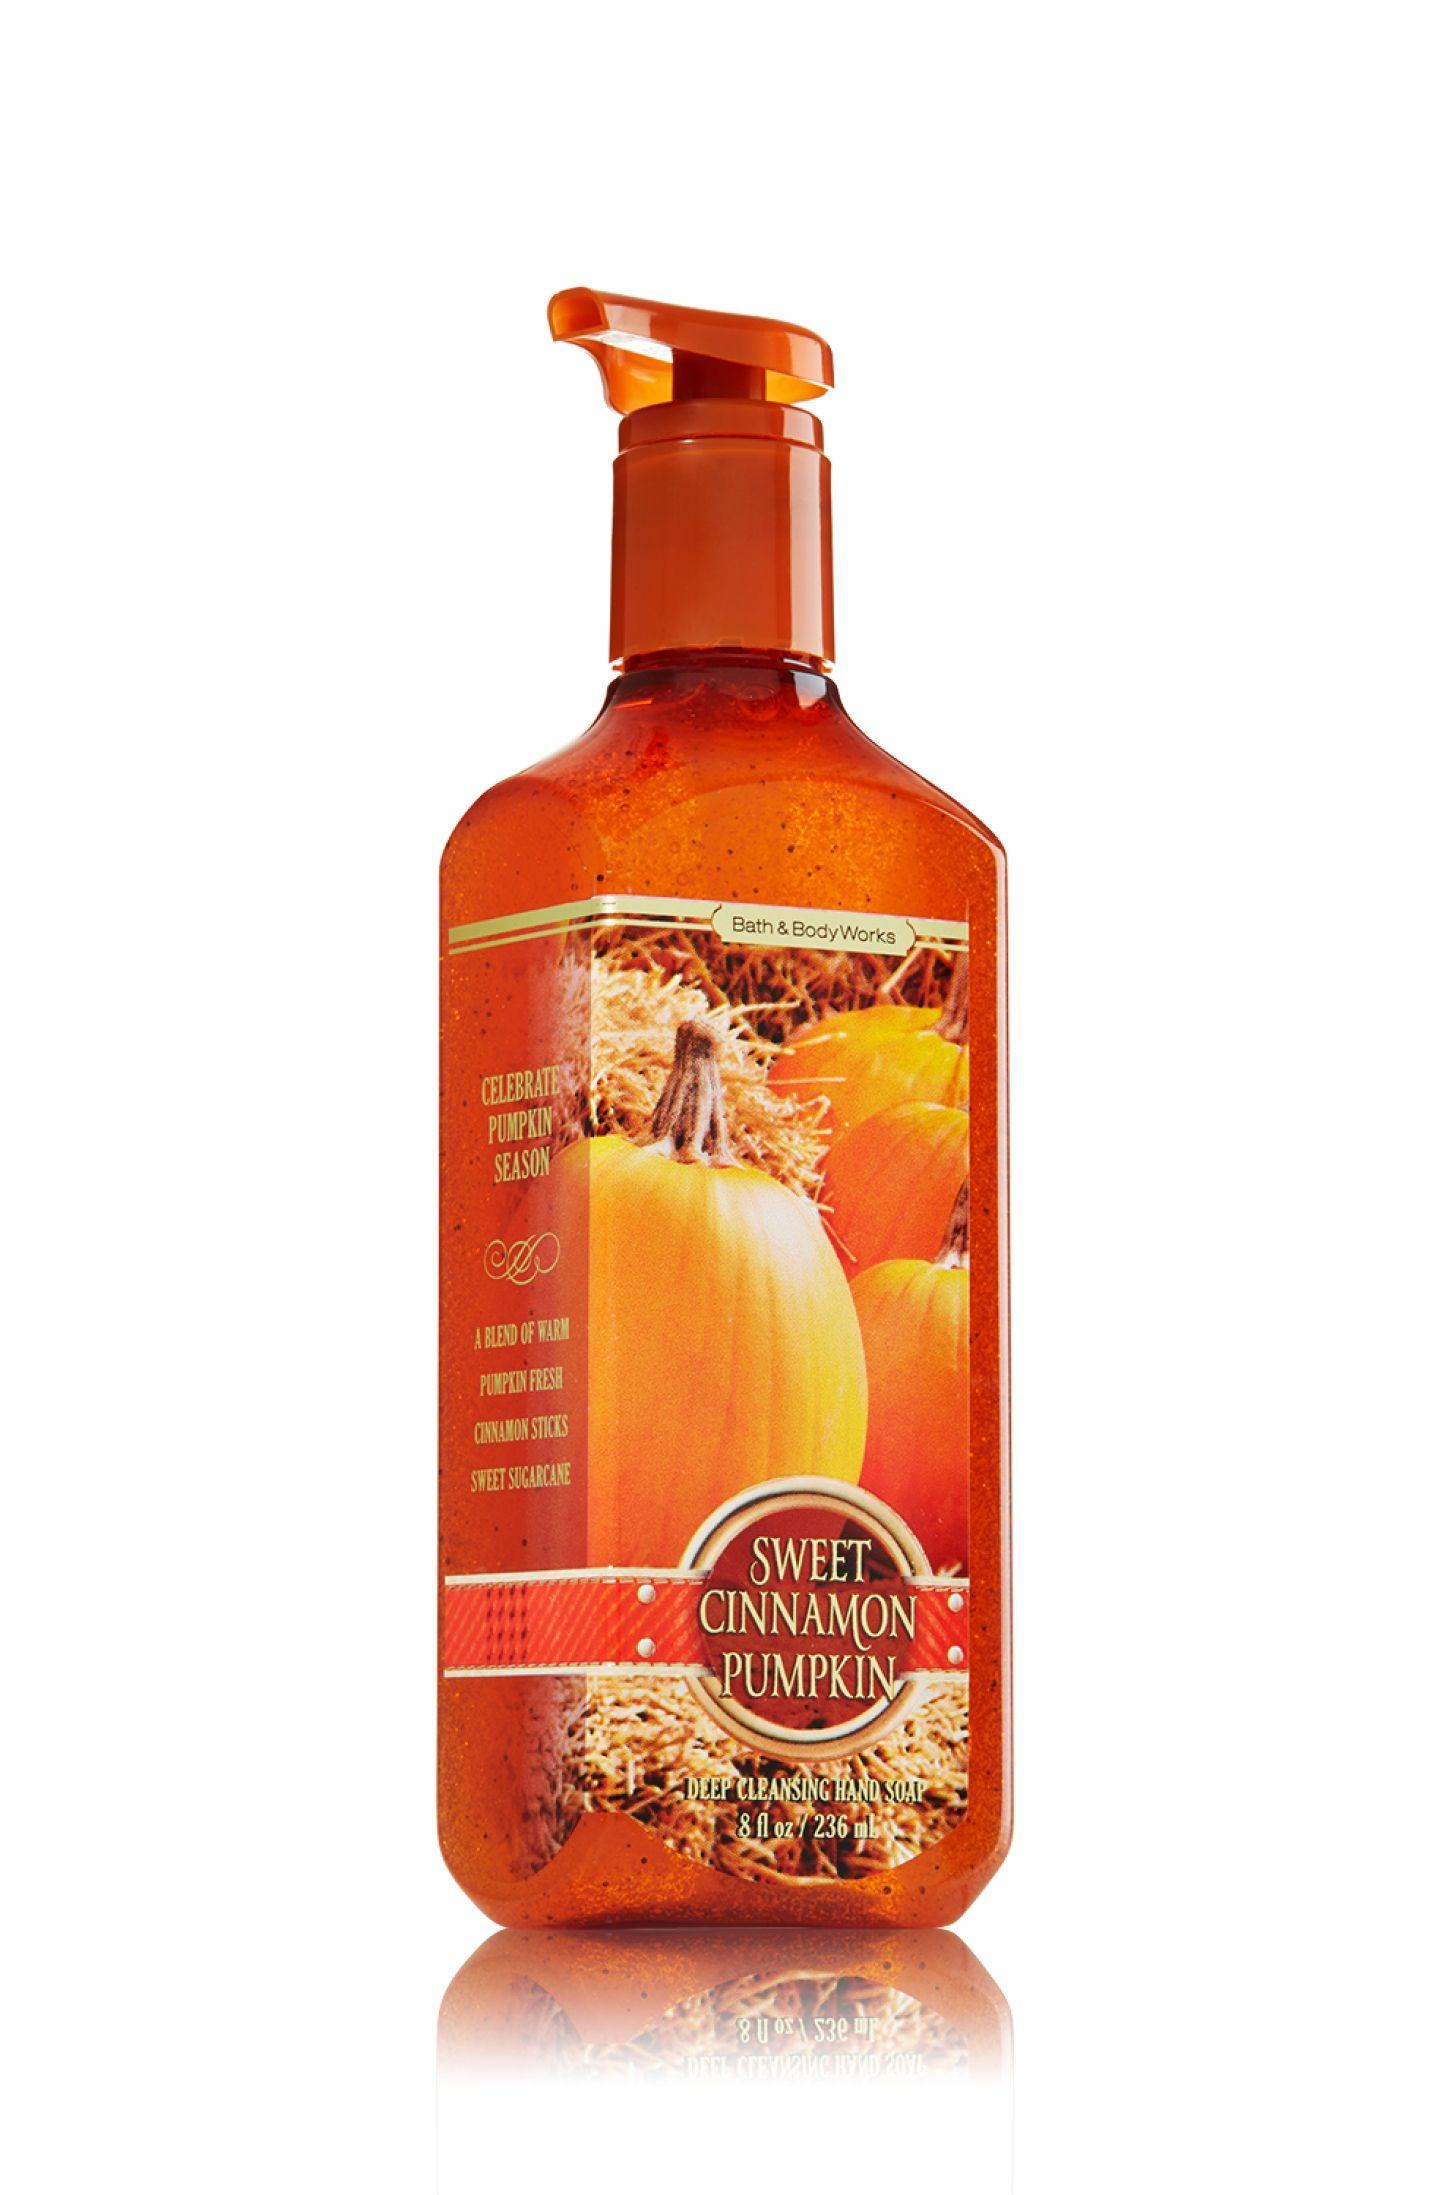 Sweet Cinnamon Pumpkin Deep Cleansing Hand Soap Soap Sanitizer